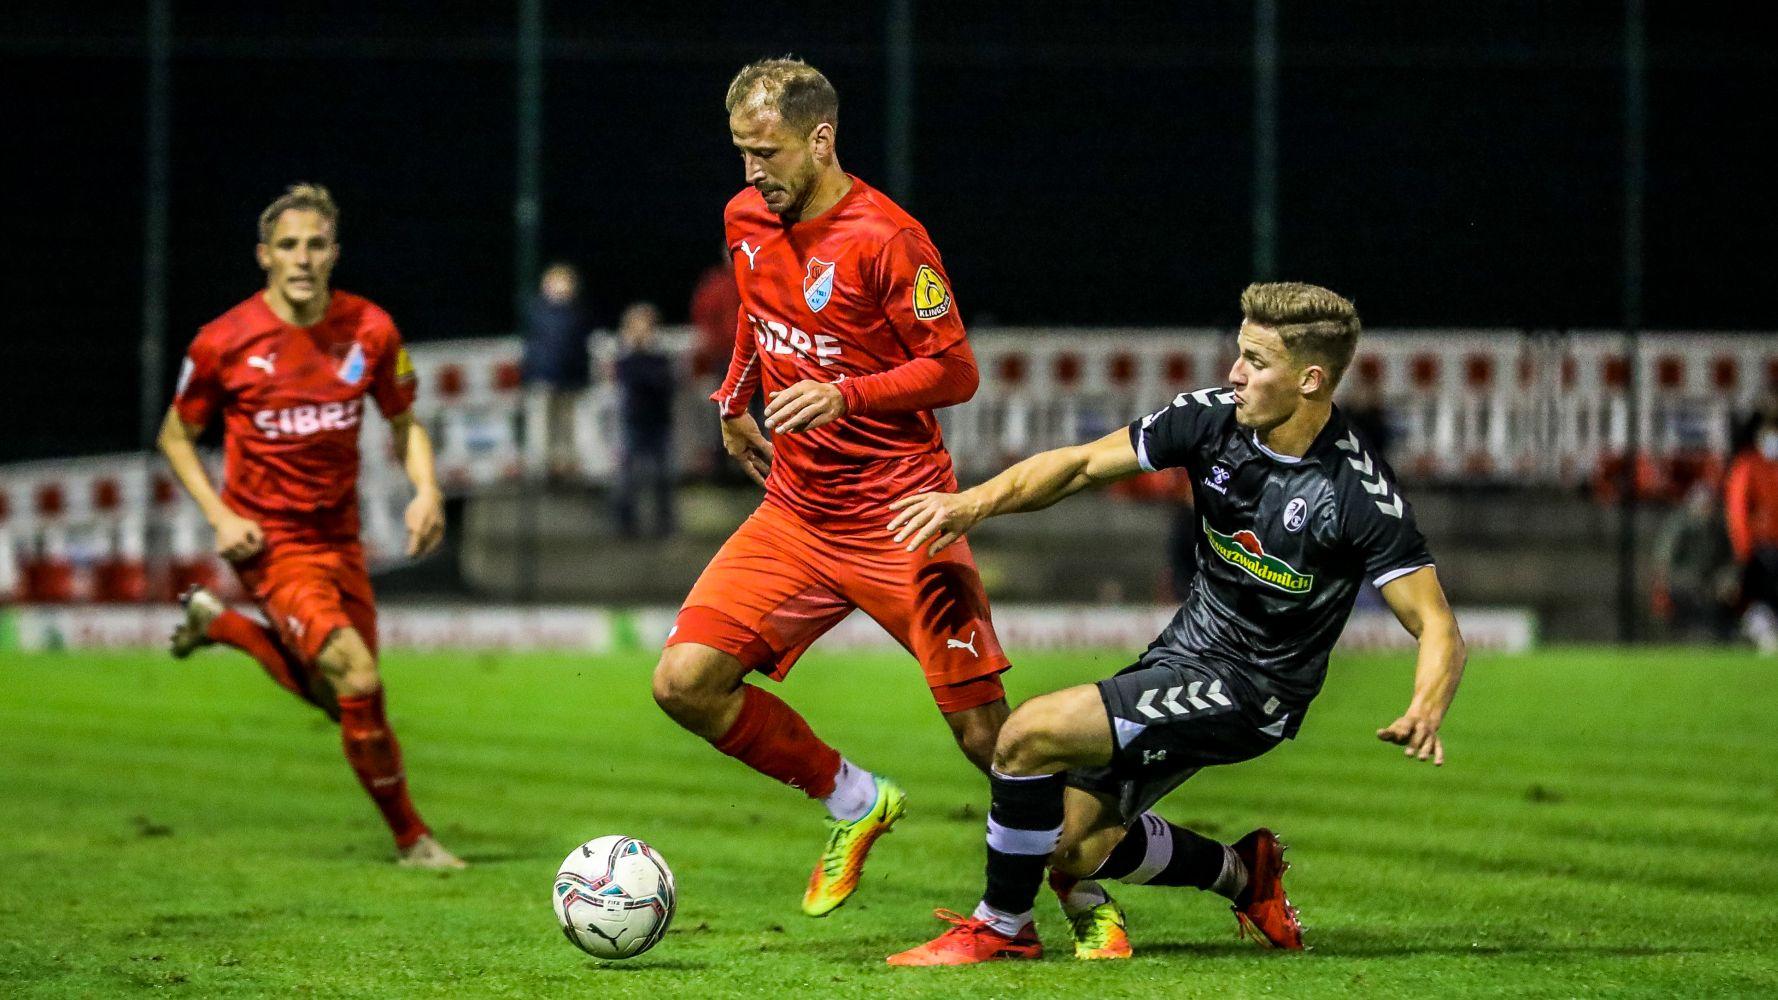 Bisanovic Freiburg TSV Steinbach Haiger HP